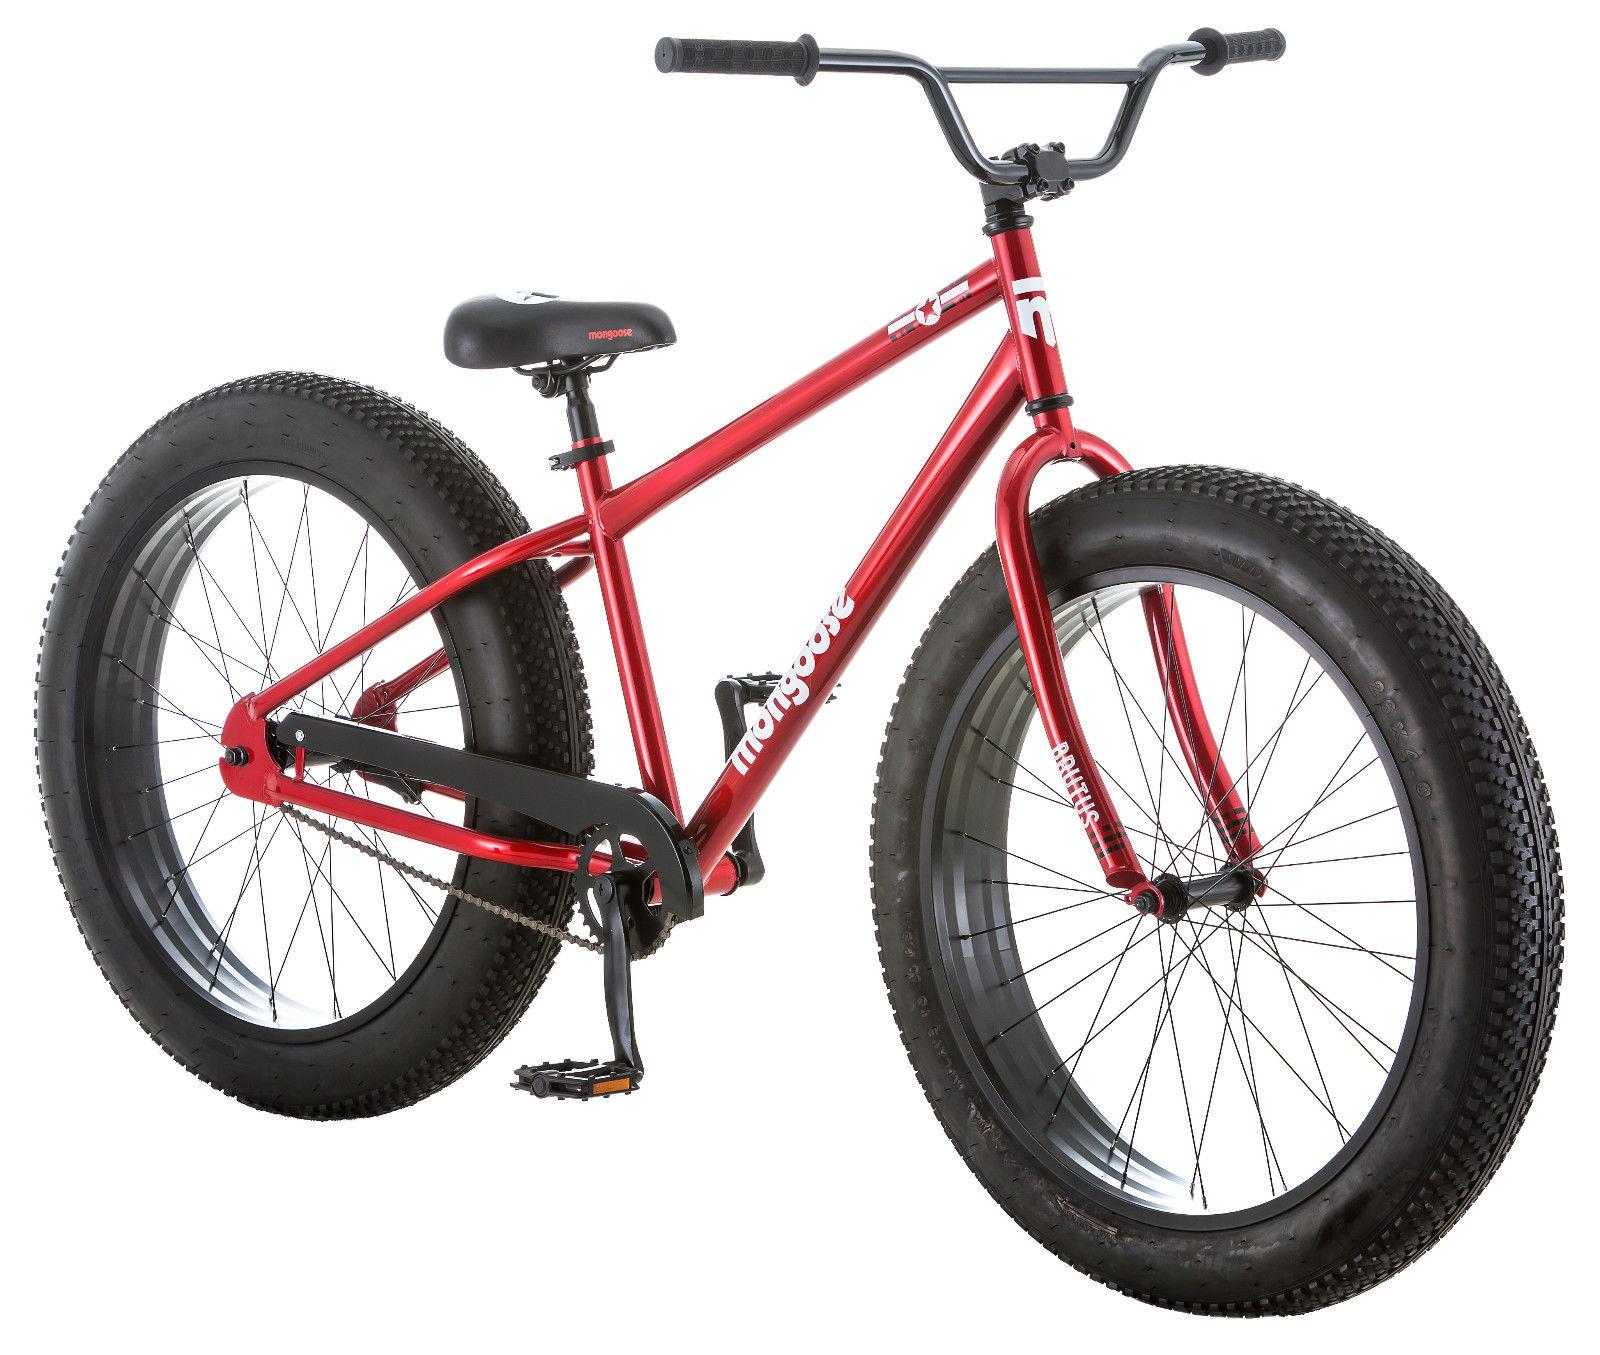 "26"" Mongoose Men's Brutus Fat Tire Bike, Red $135.99"